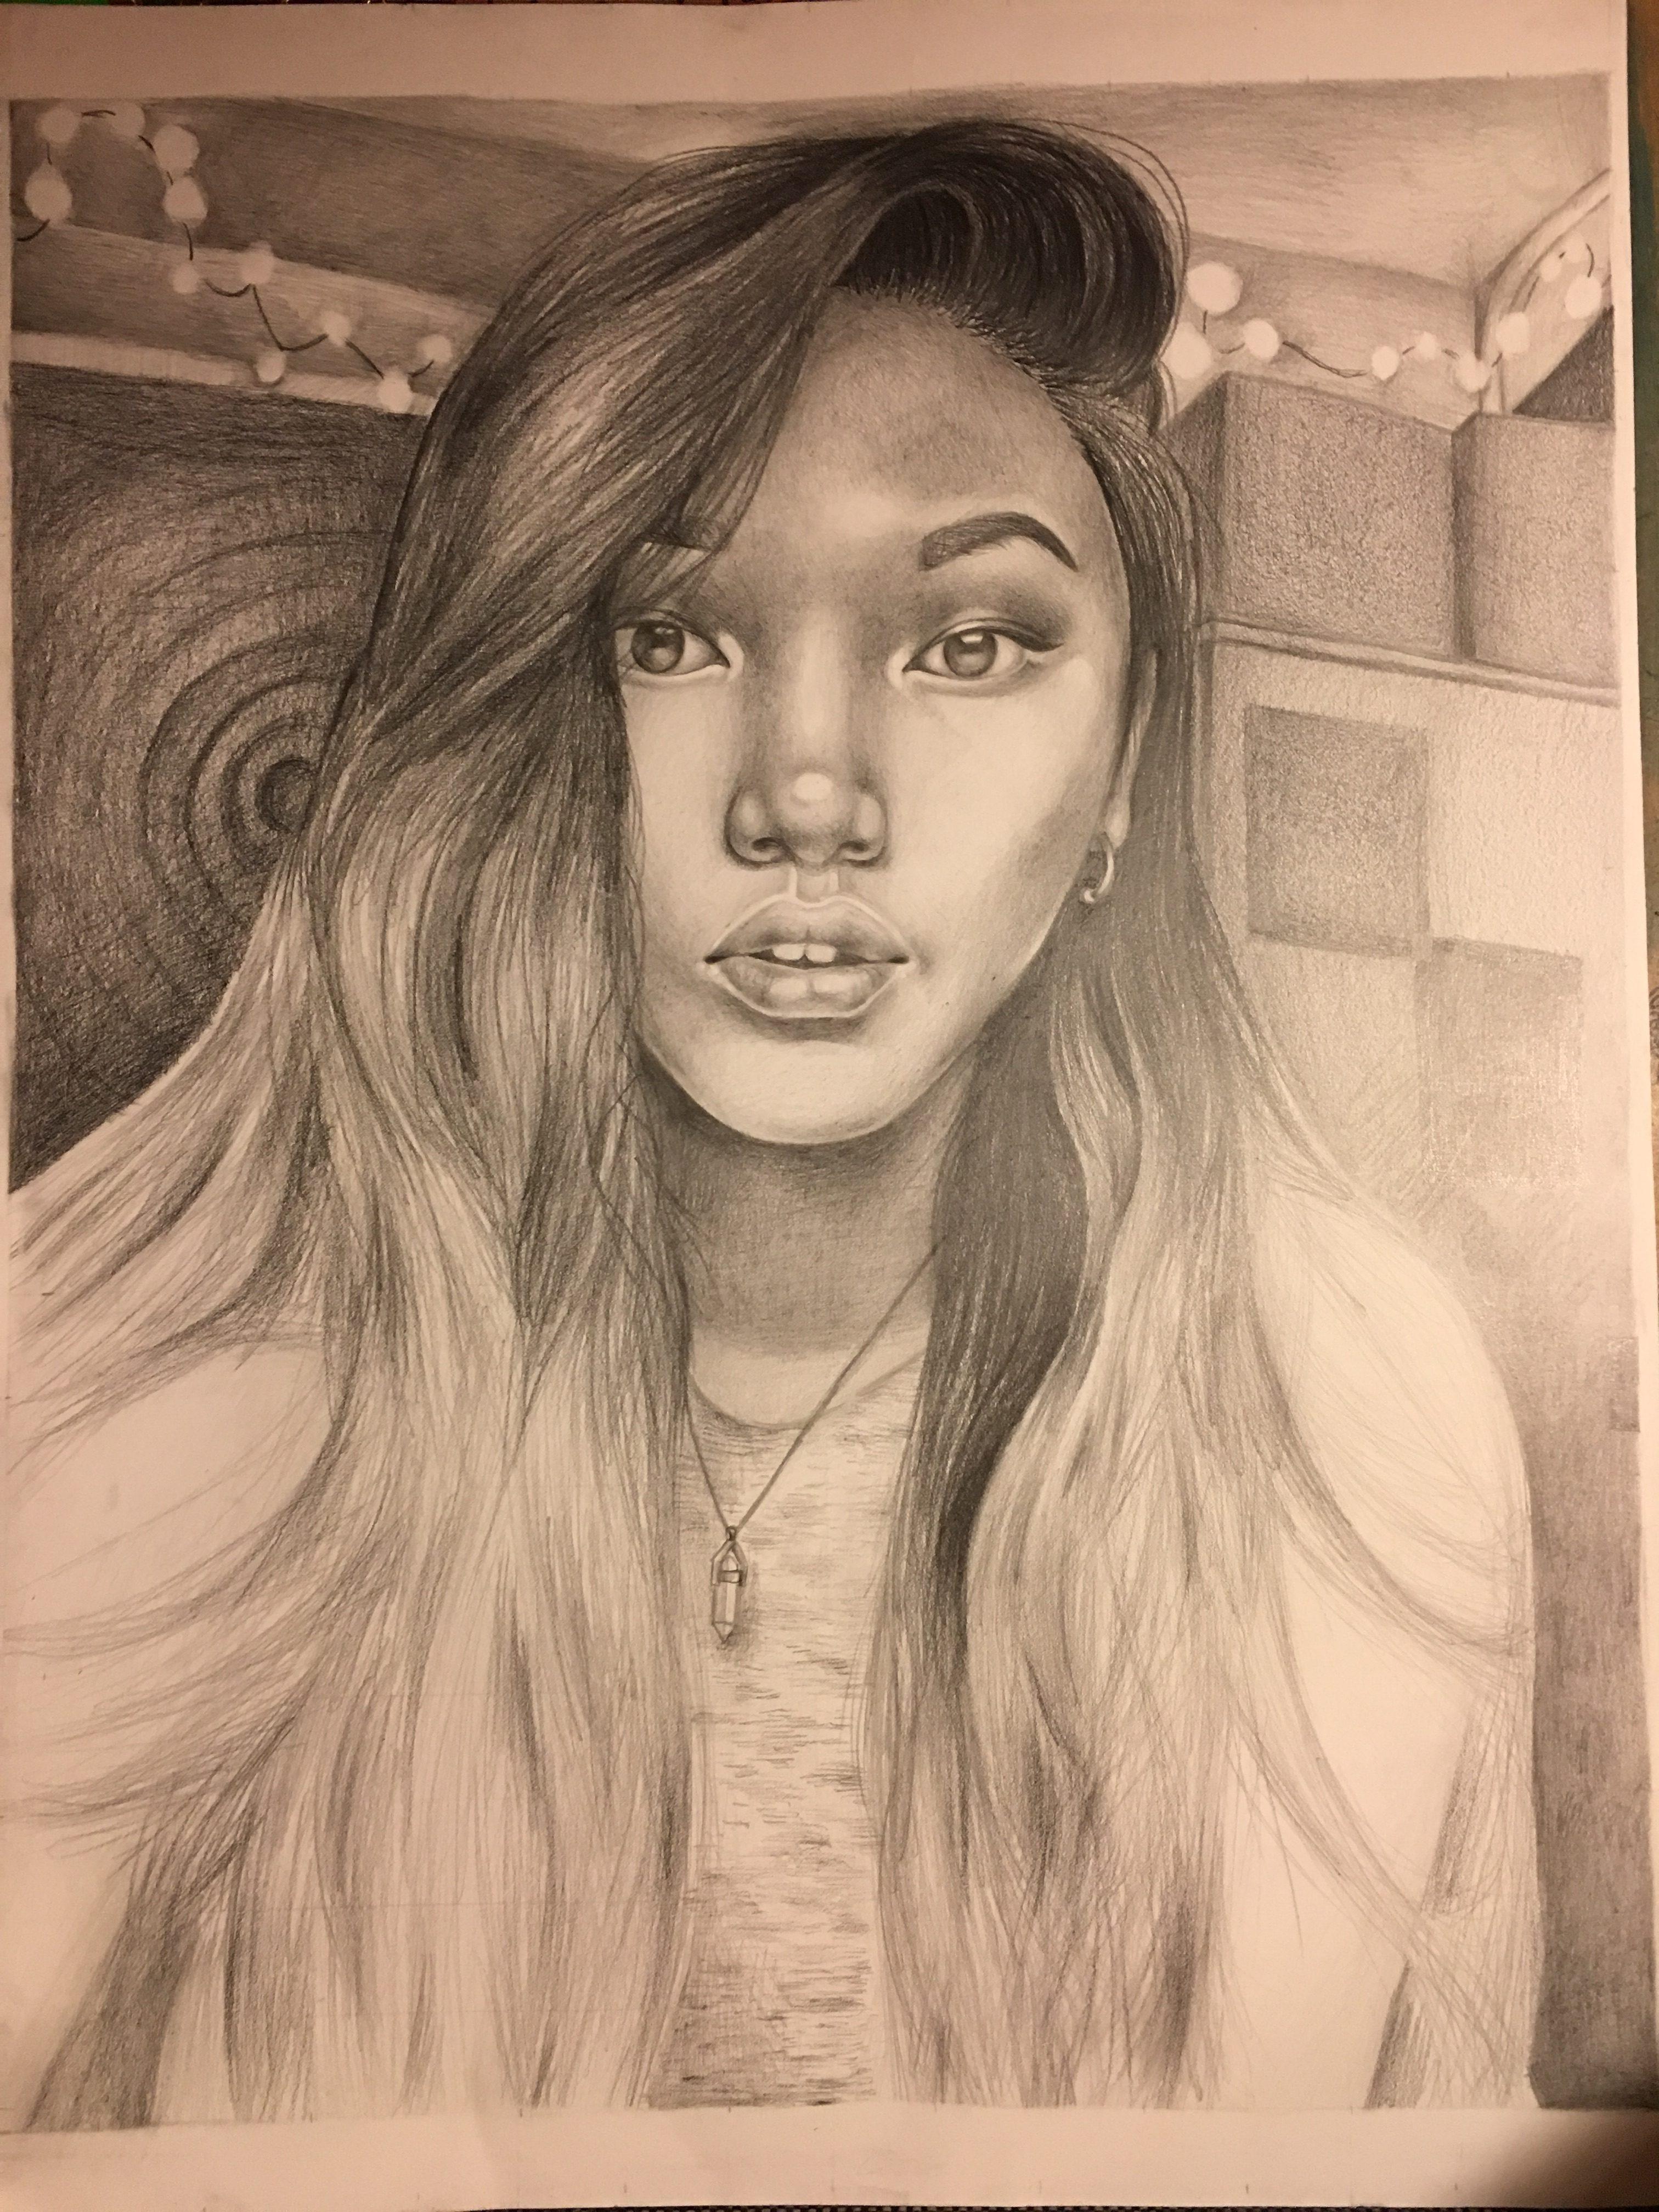 Self Portrait (Drawing/Imaging)